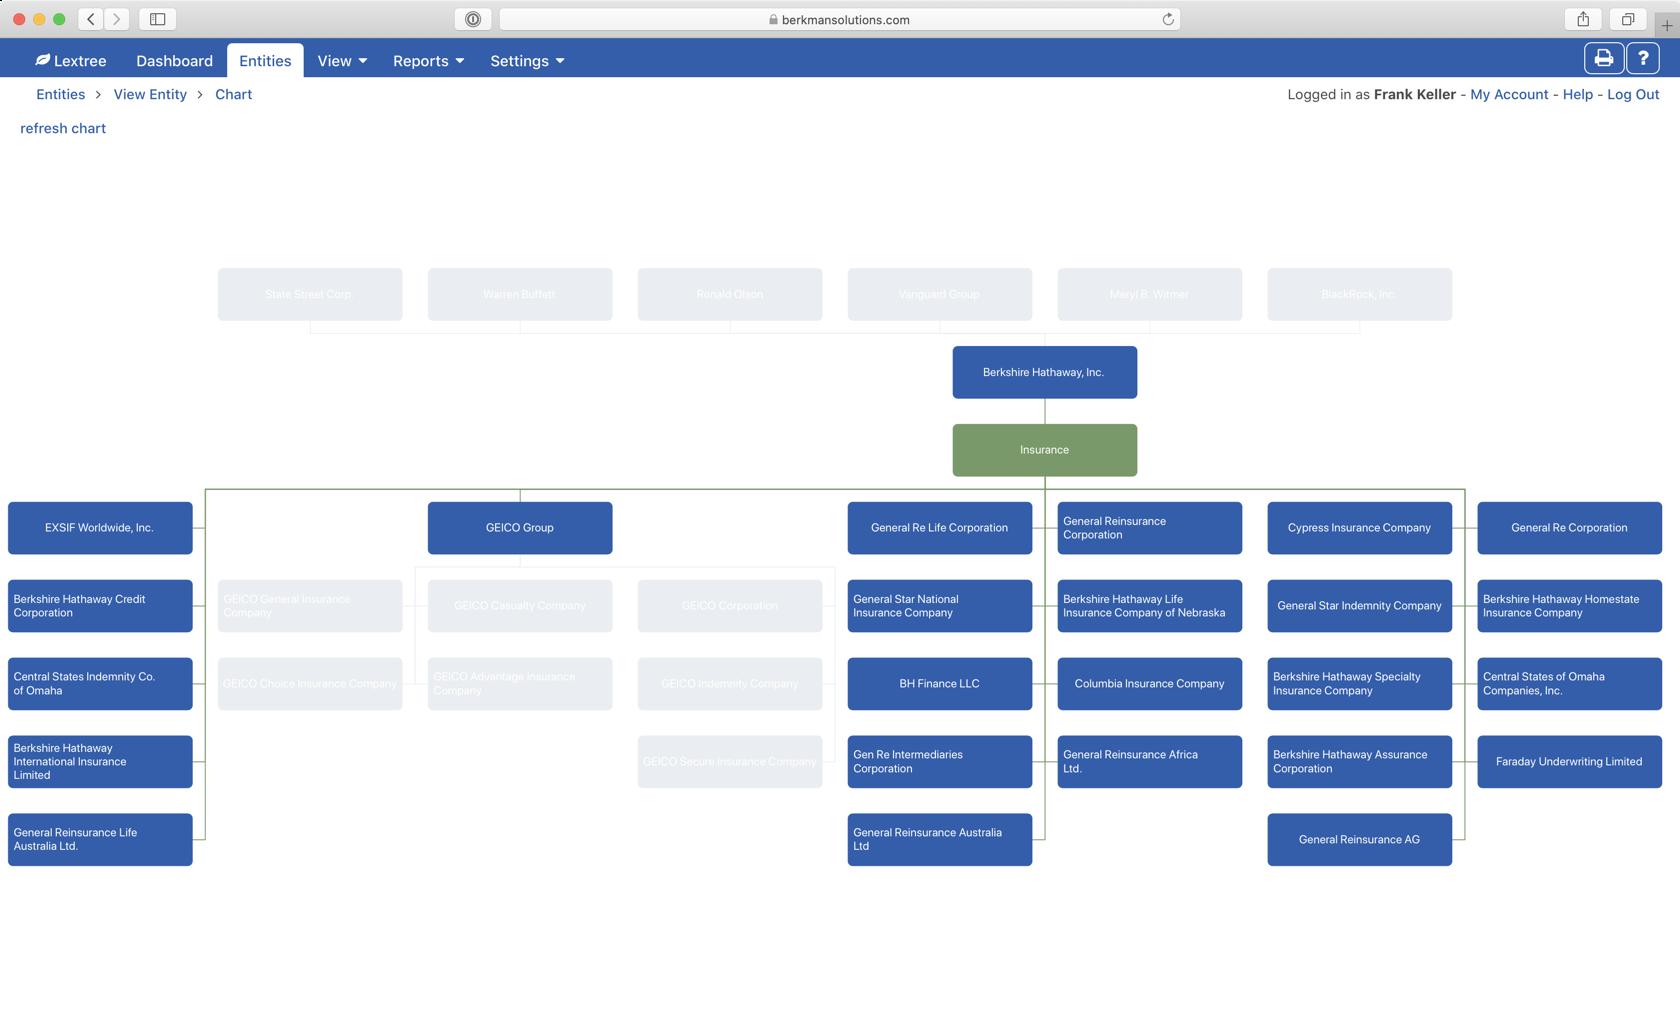 Berkshire Hathaway Insurance segment structure